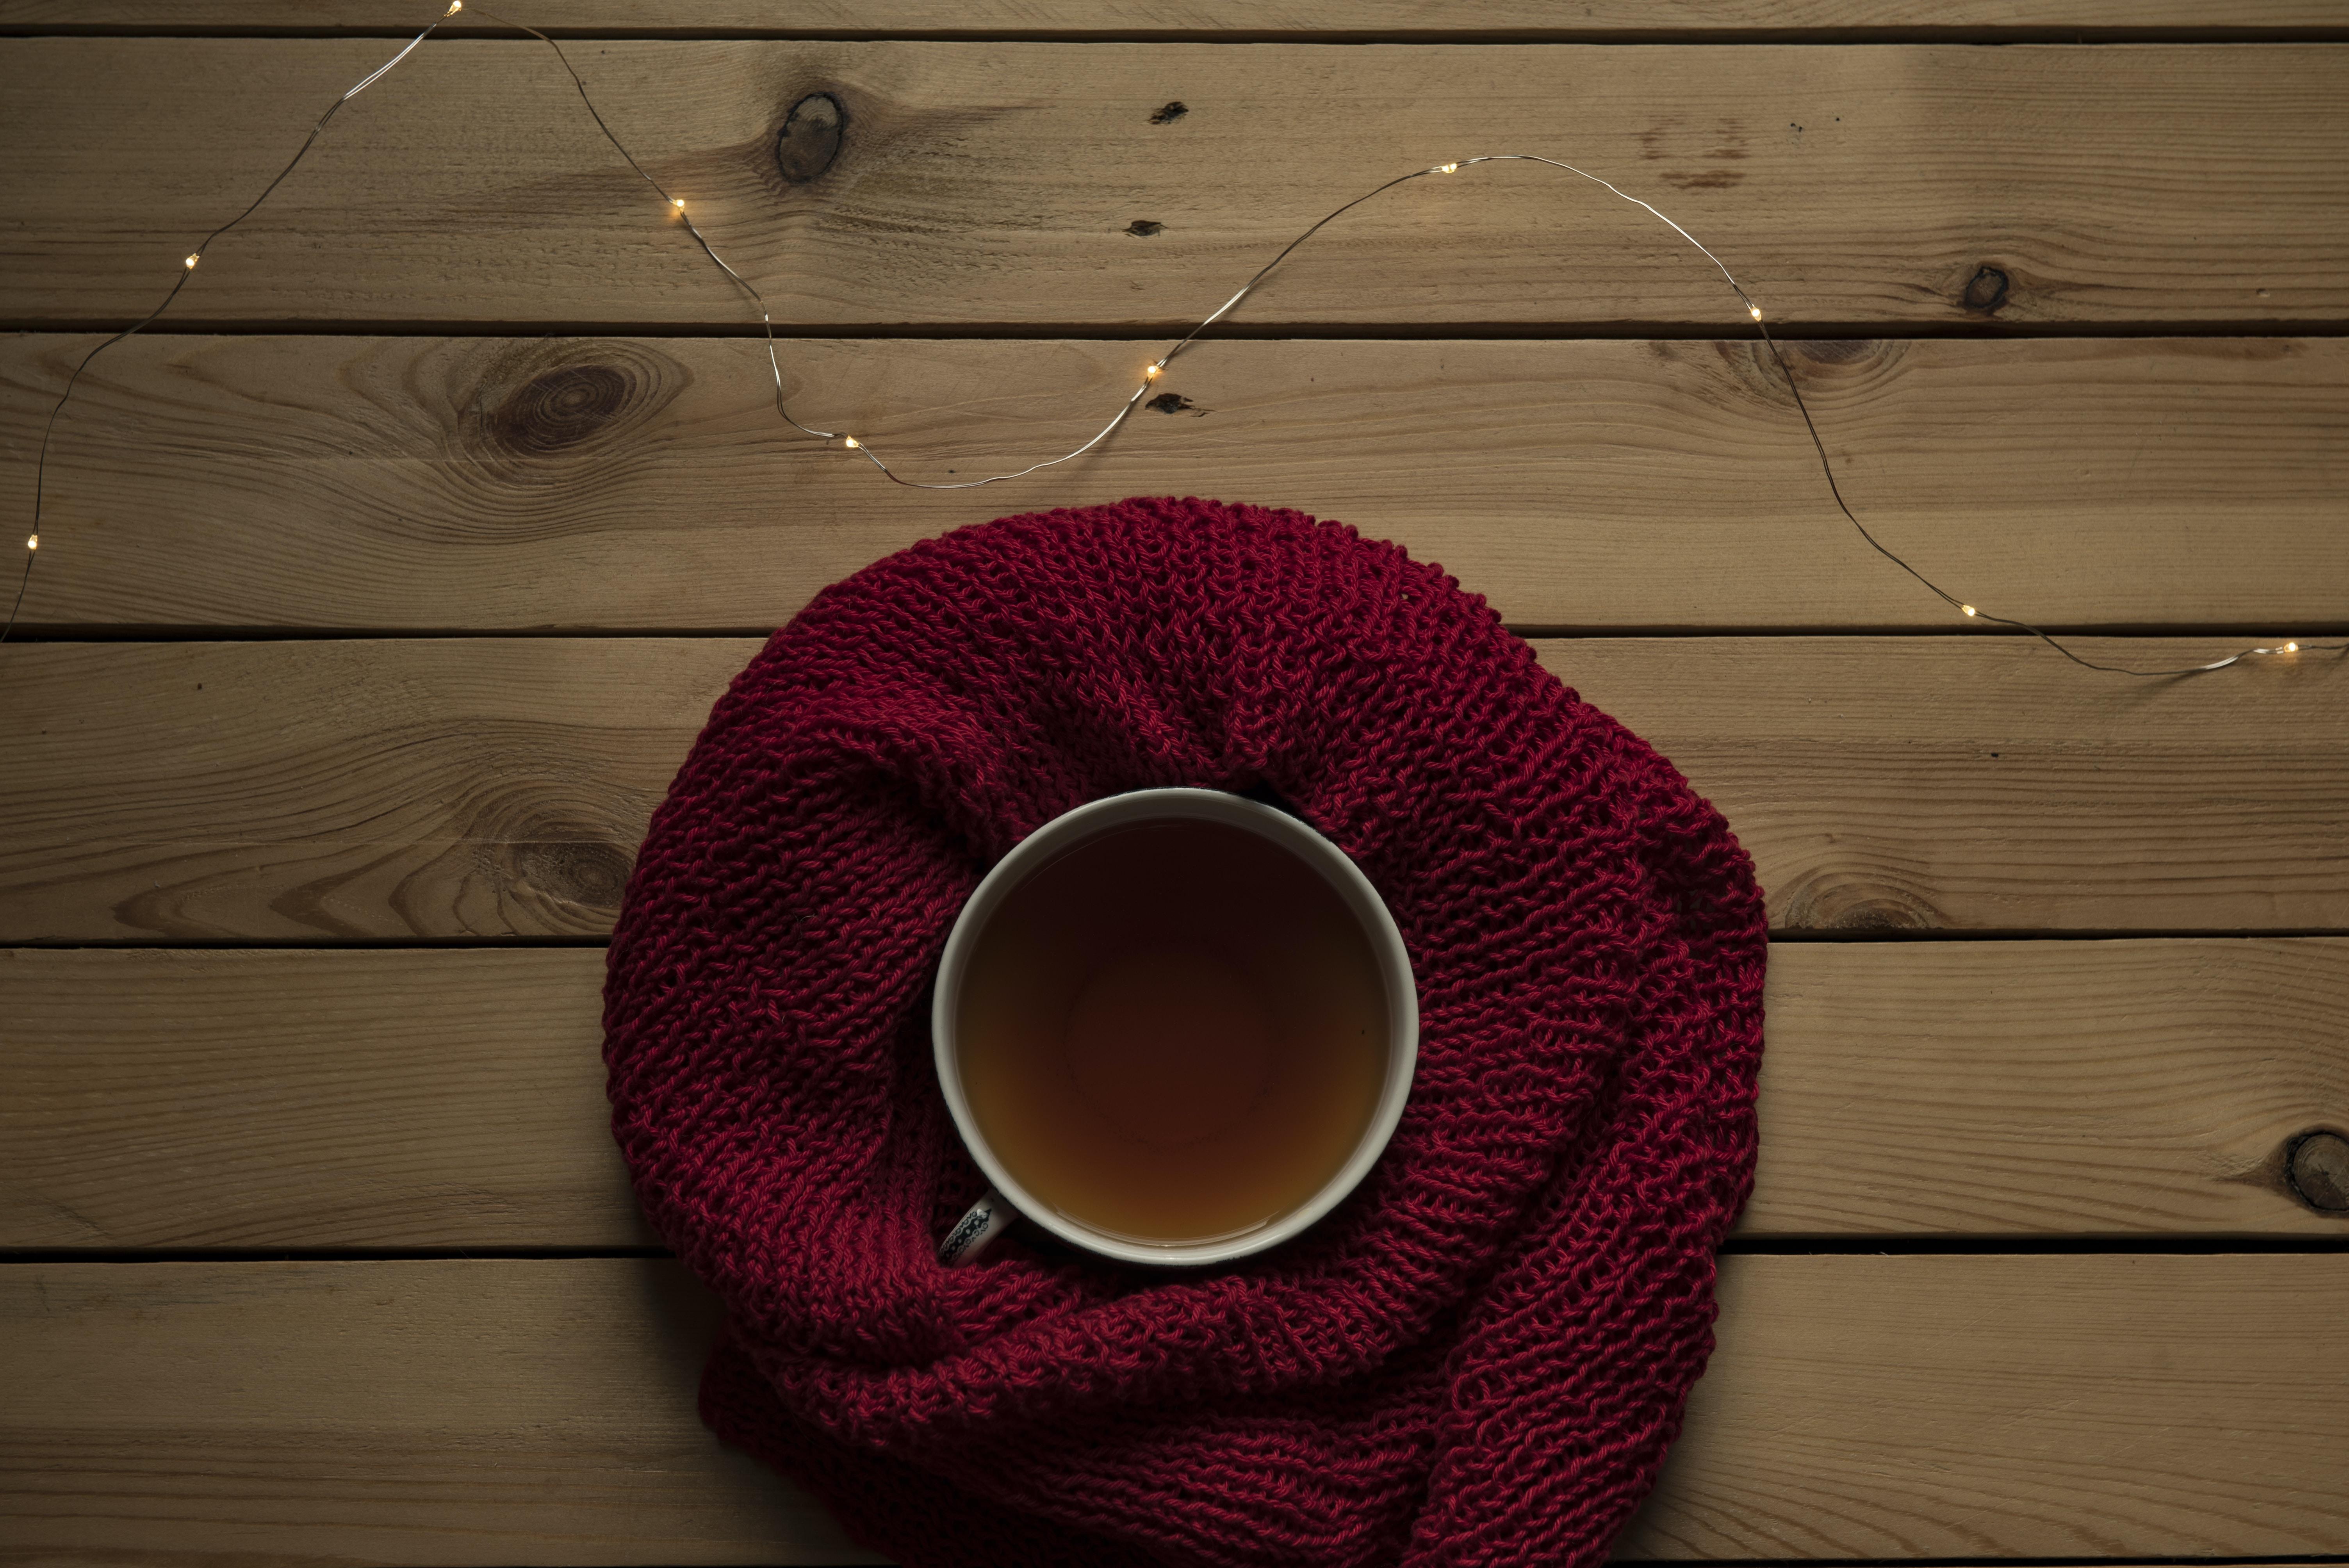 mug on red knit apparel